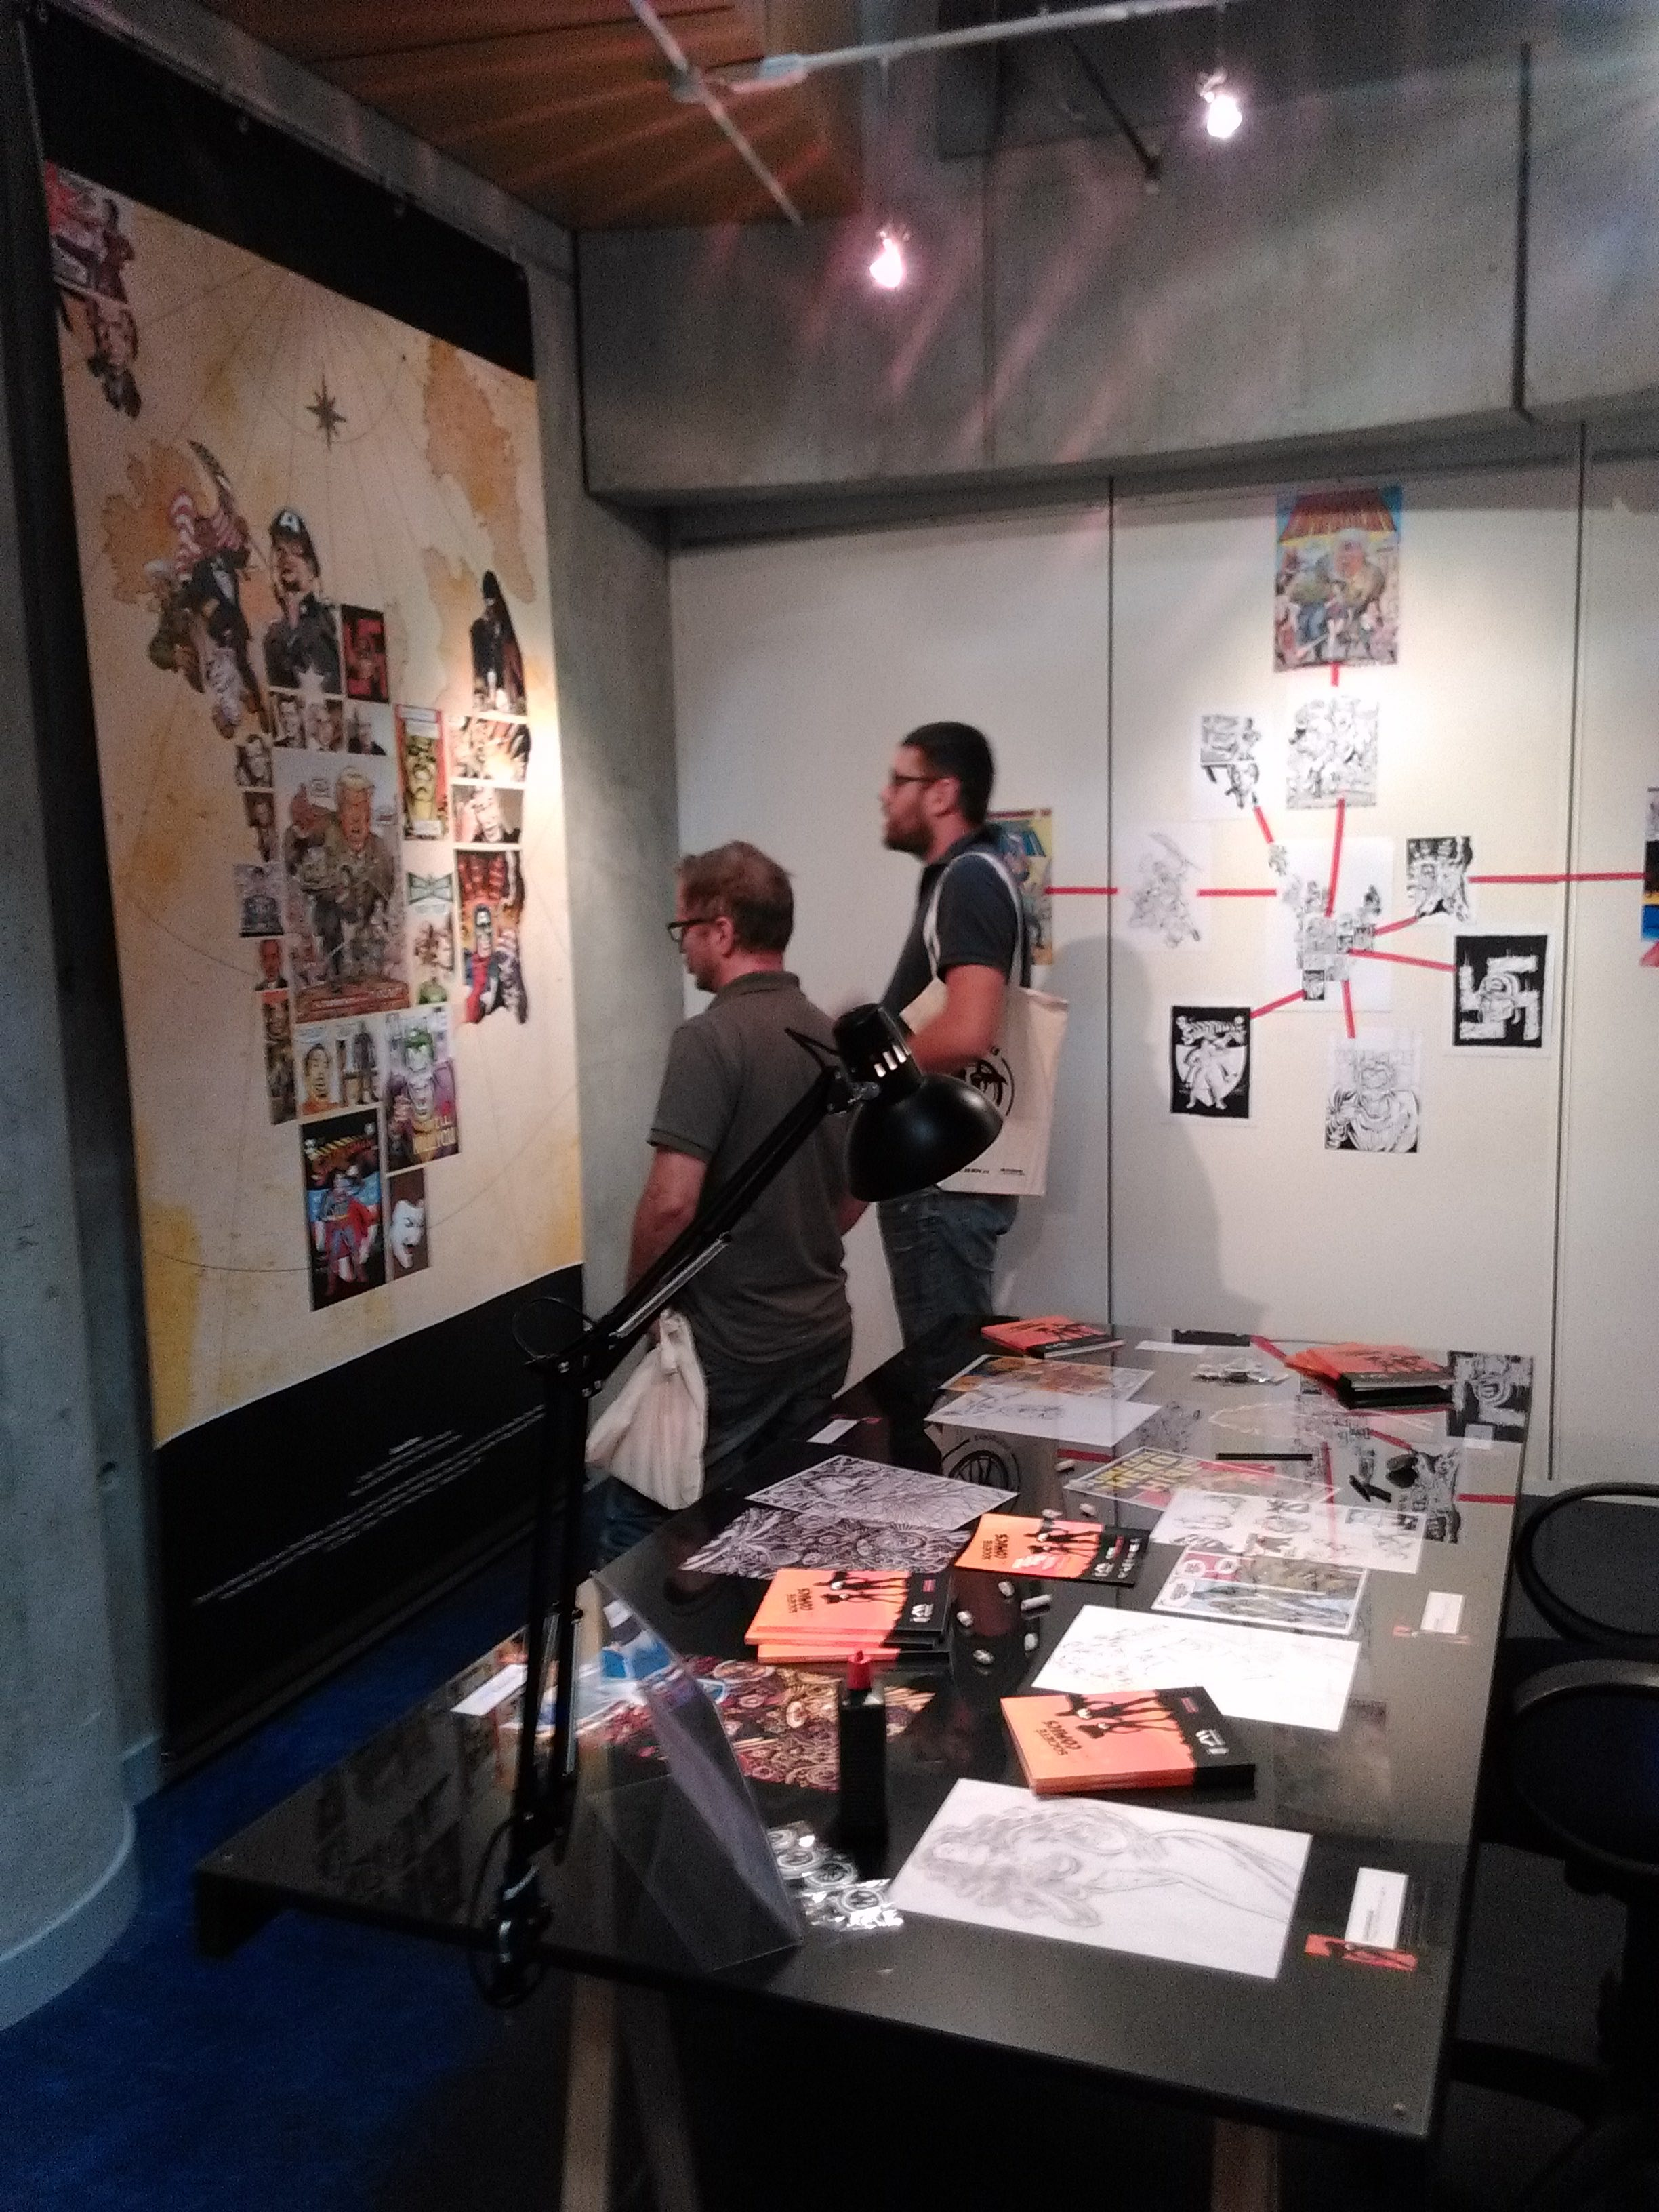 Societe comics expo table dess